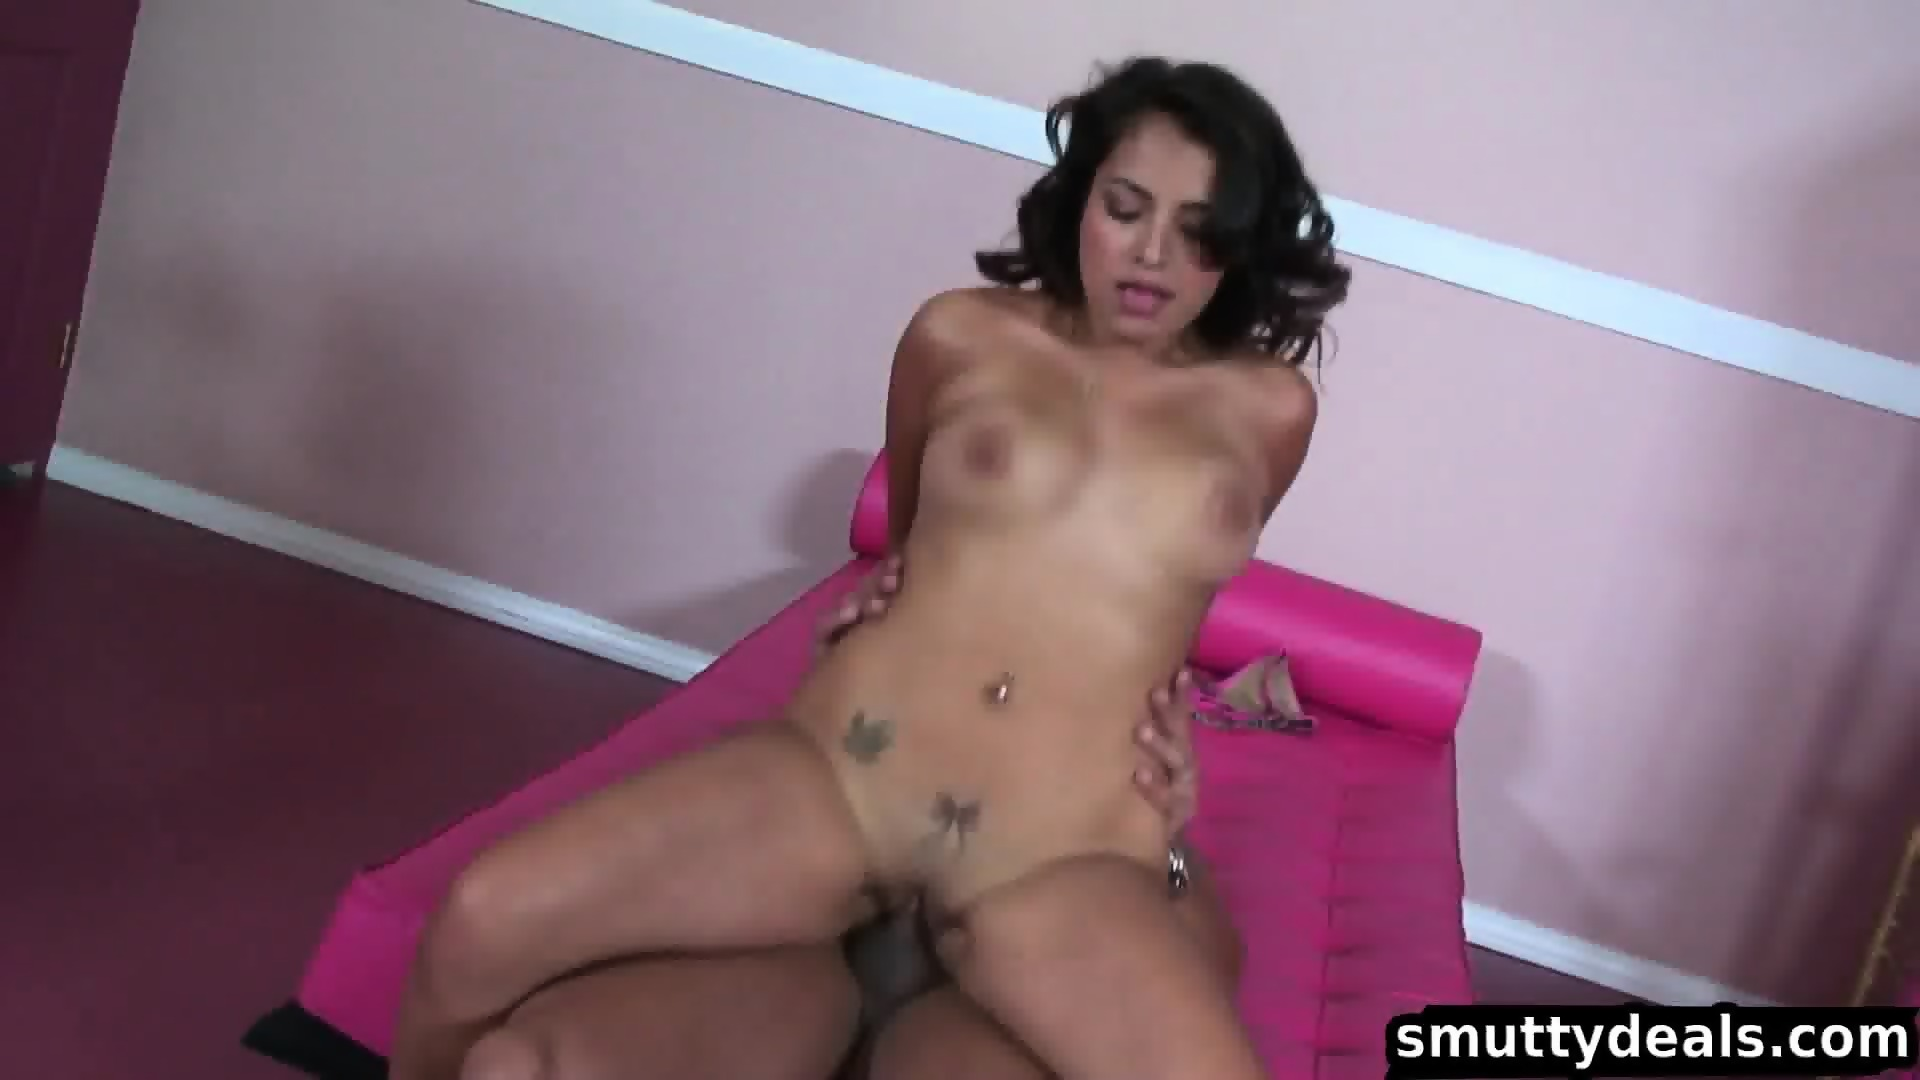 Yoyo slut wife